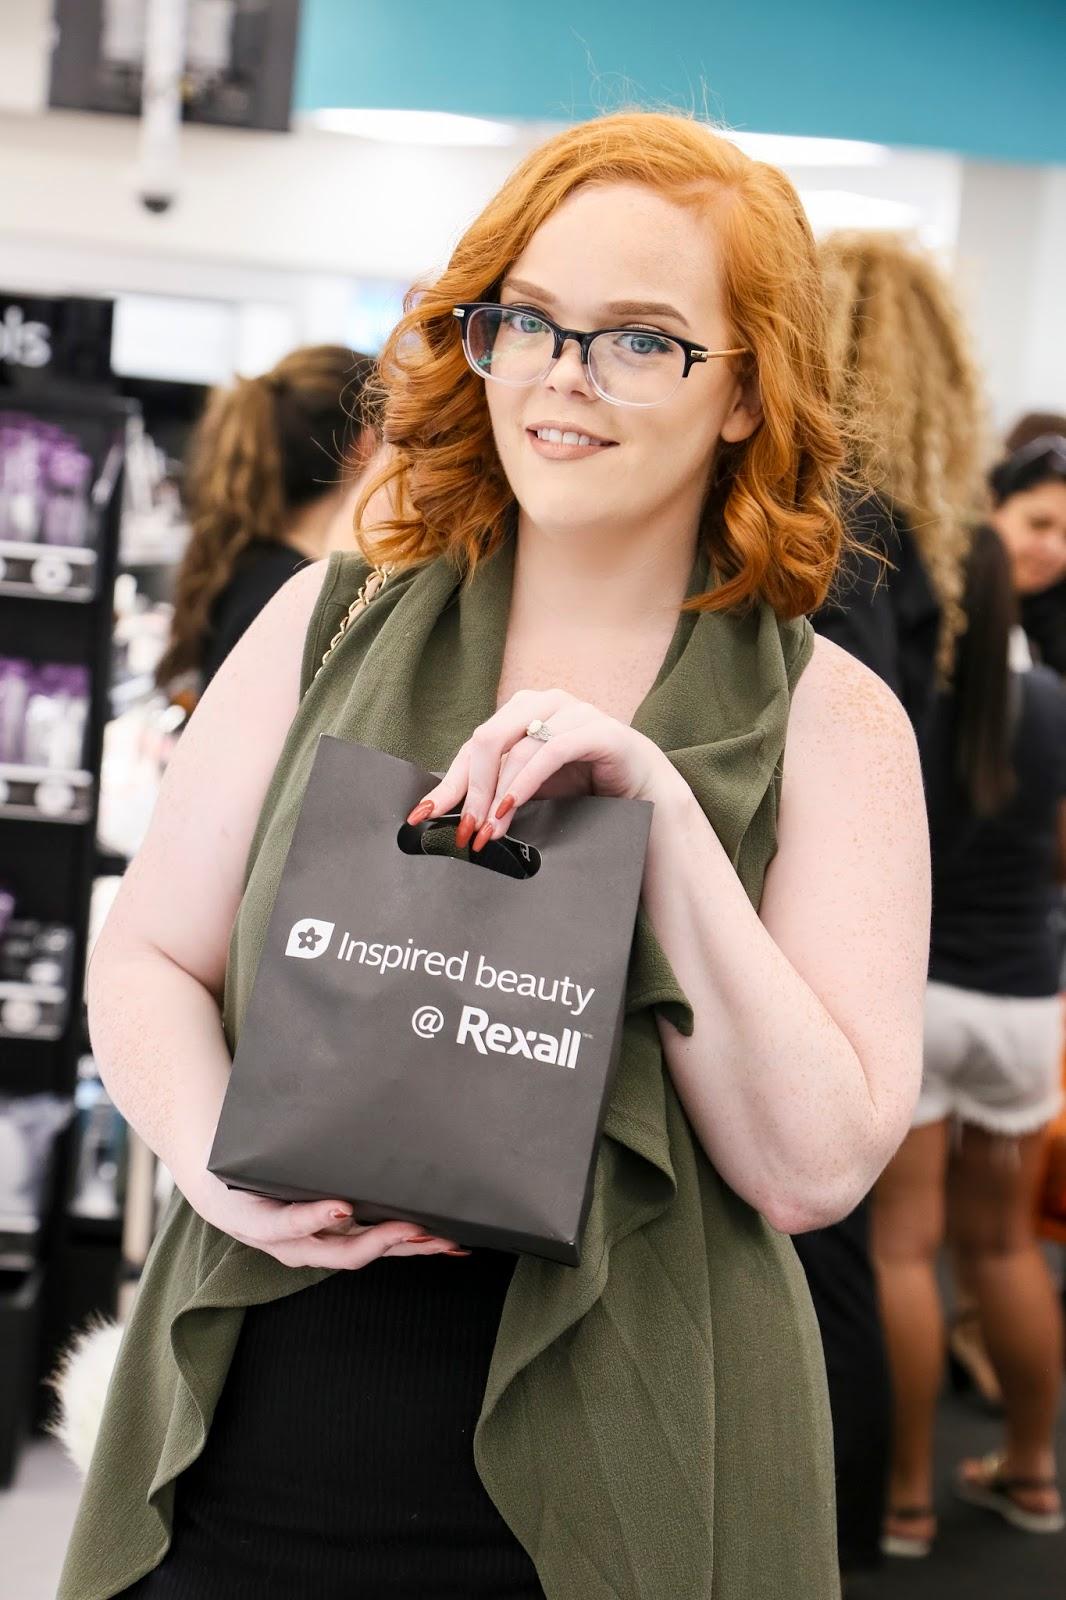 #InspiredBeauty | Rexall's New Beauty Department - The Next Beauty Destination | labellesirene.ca